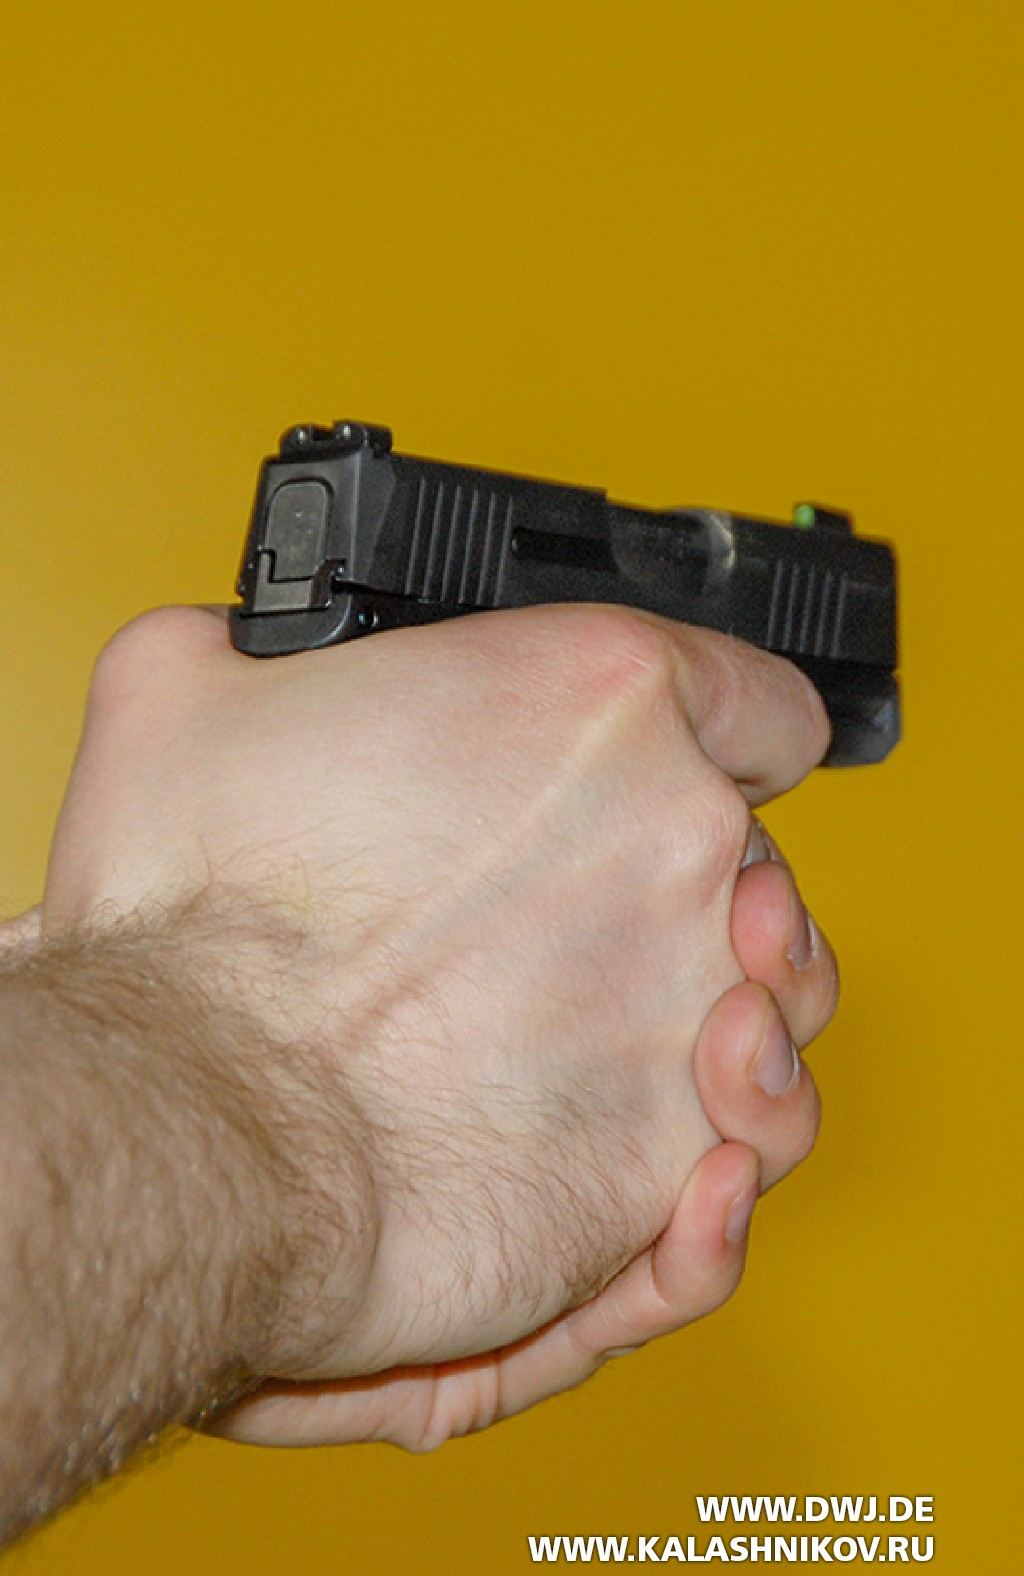 Пистолет SIG Sauer P365